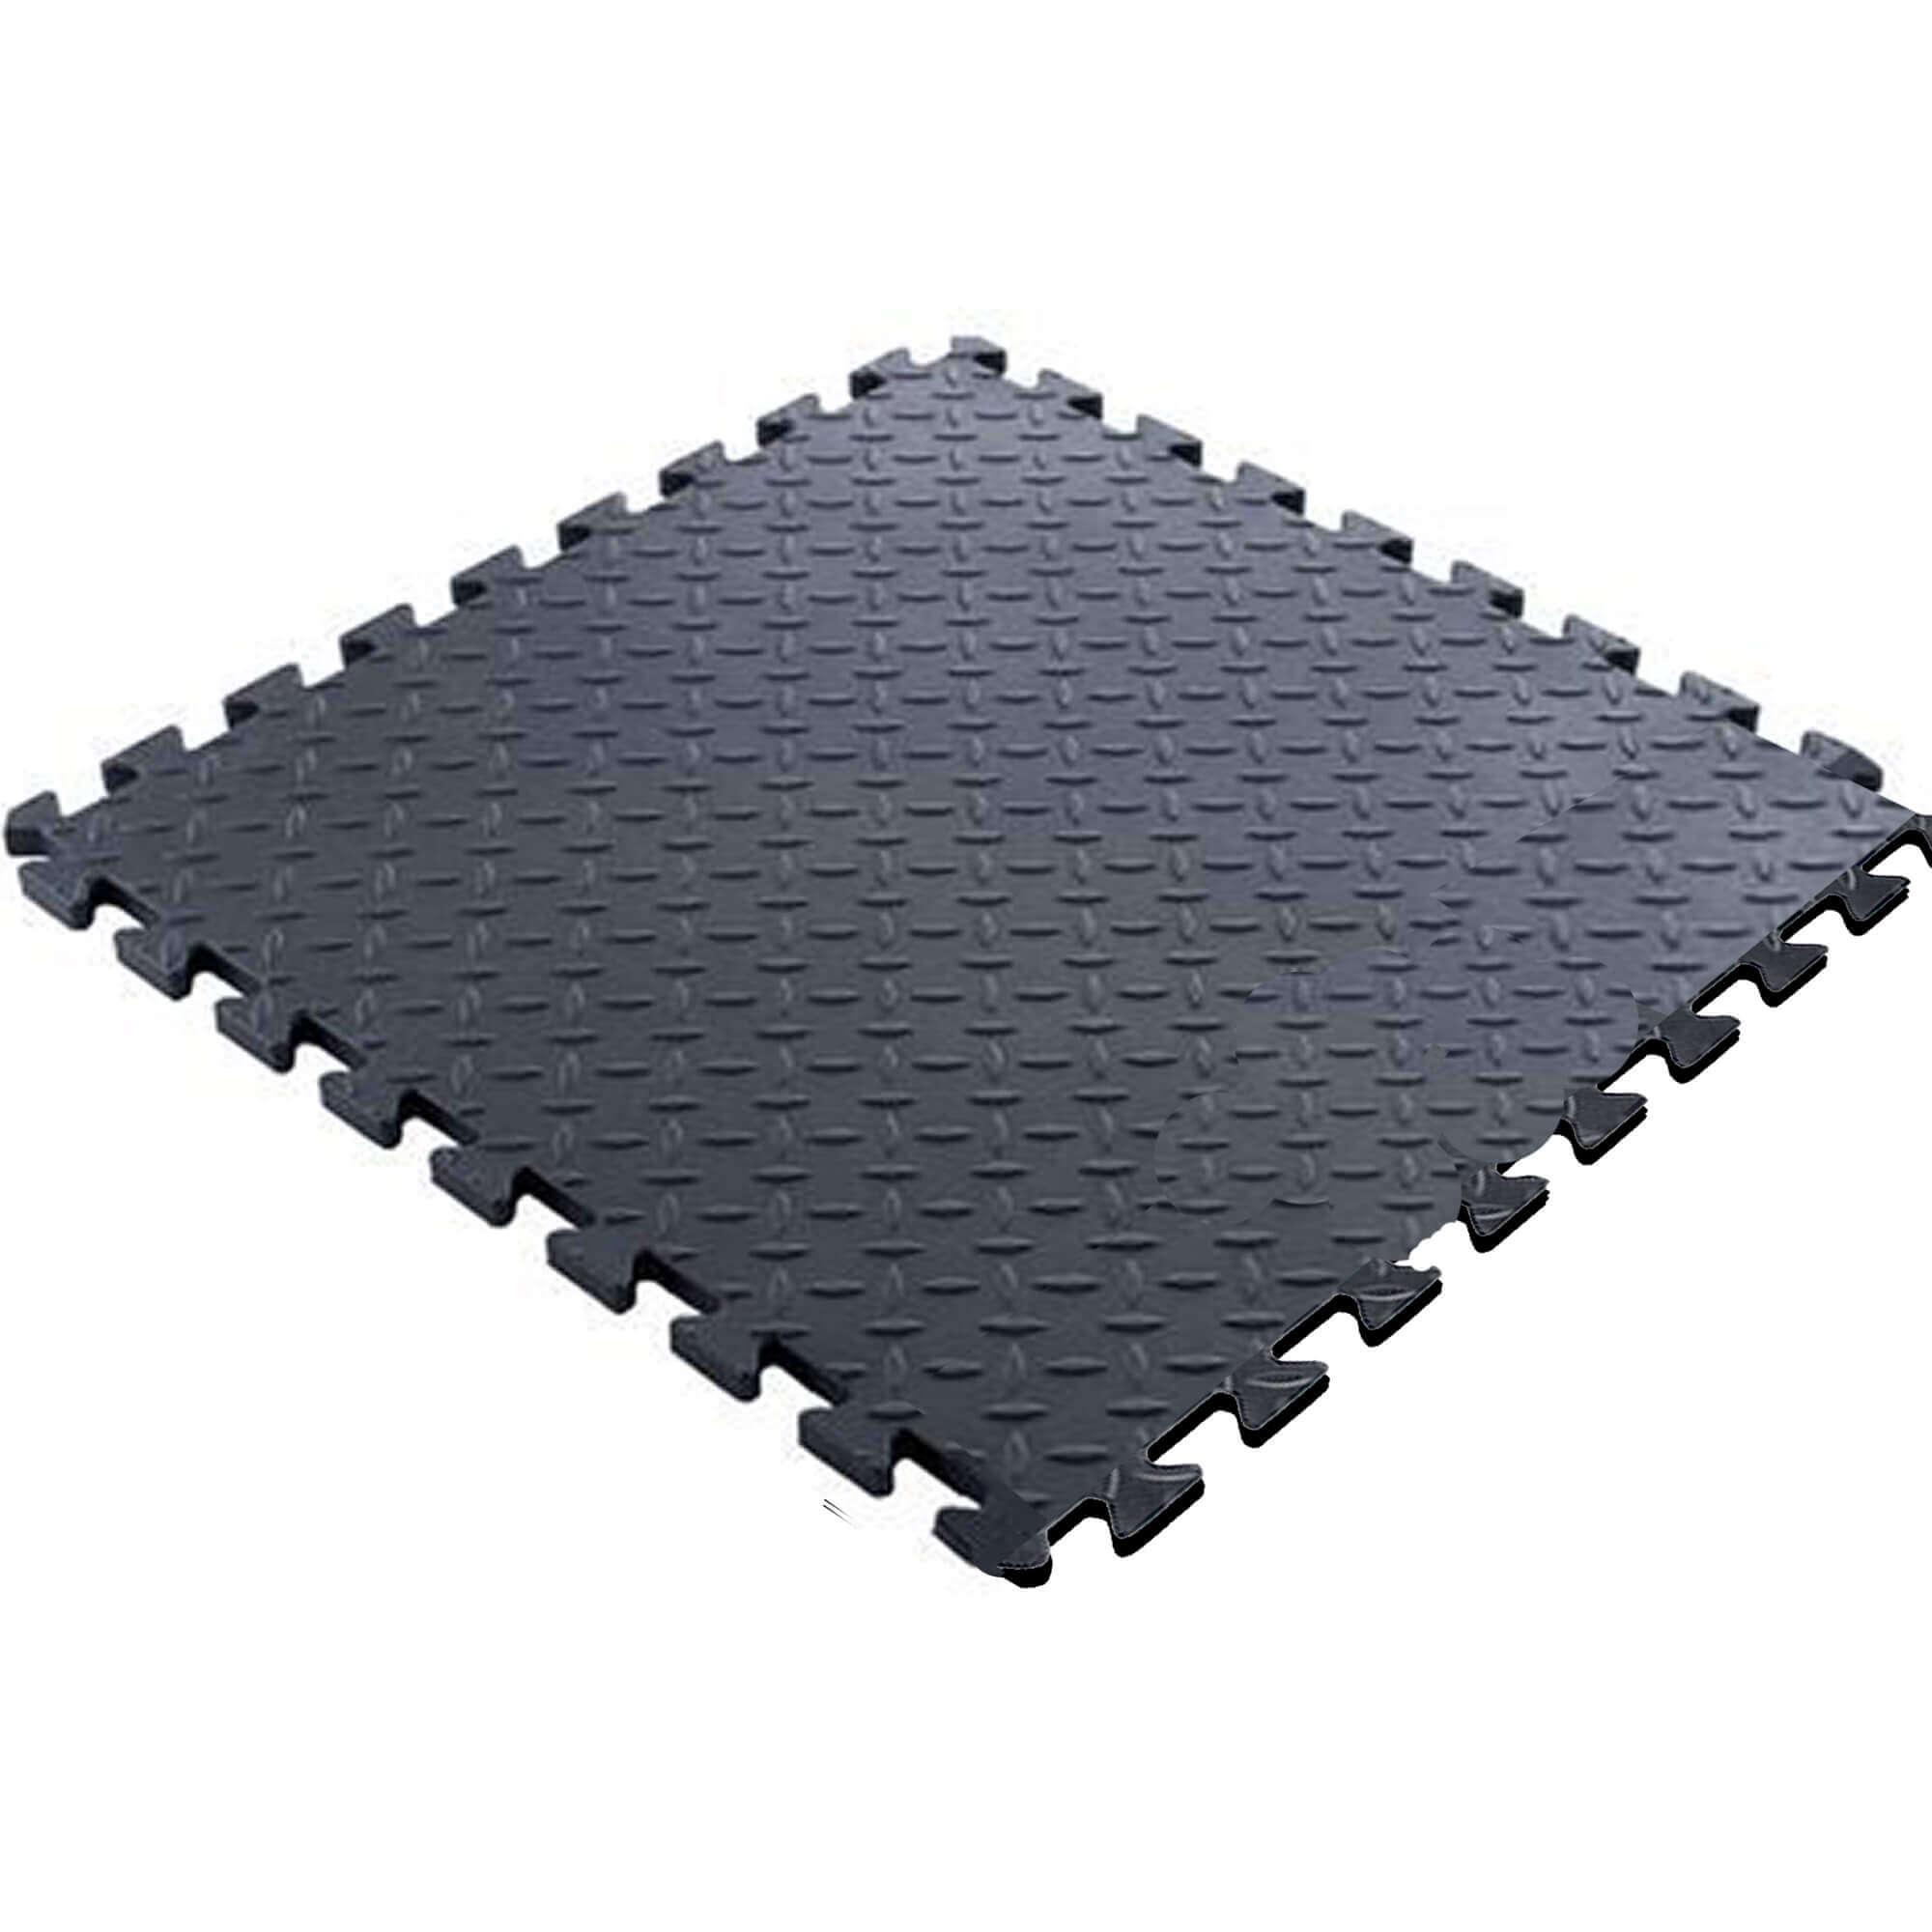 tapis antifatigue surface centre tsc6161. Black Bedroom Furniture Sets. Home Design Ideas